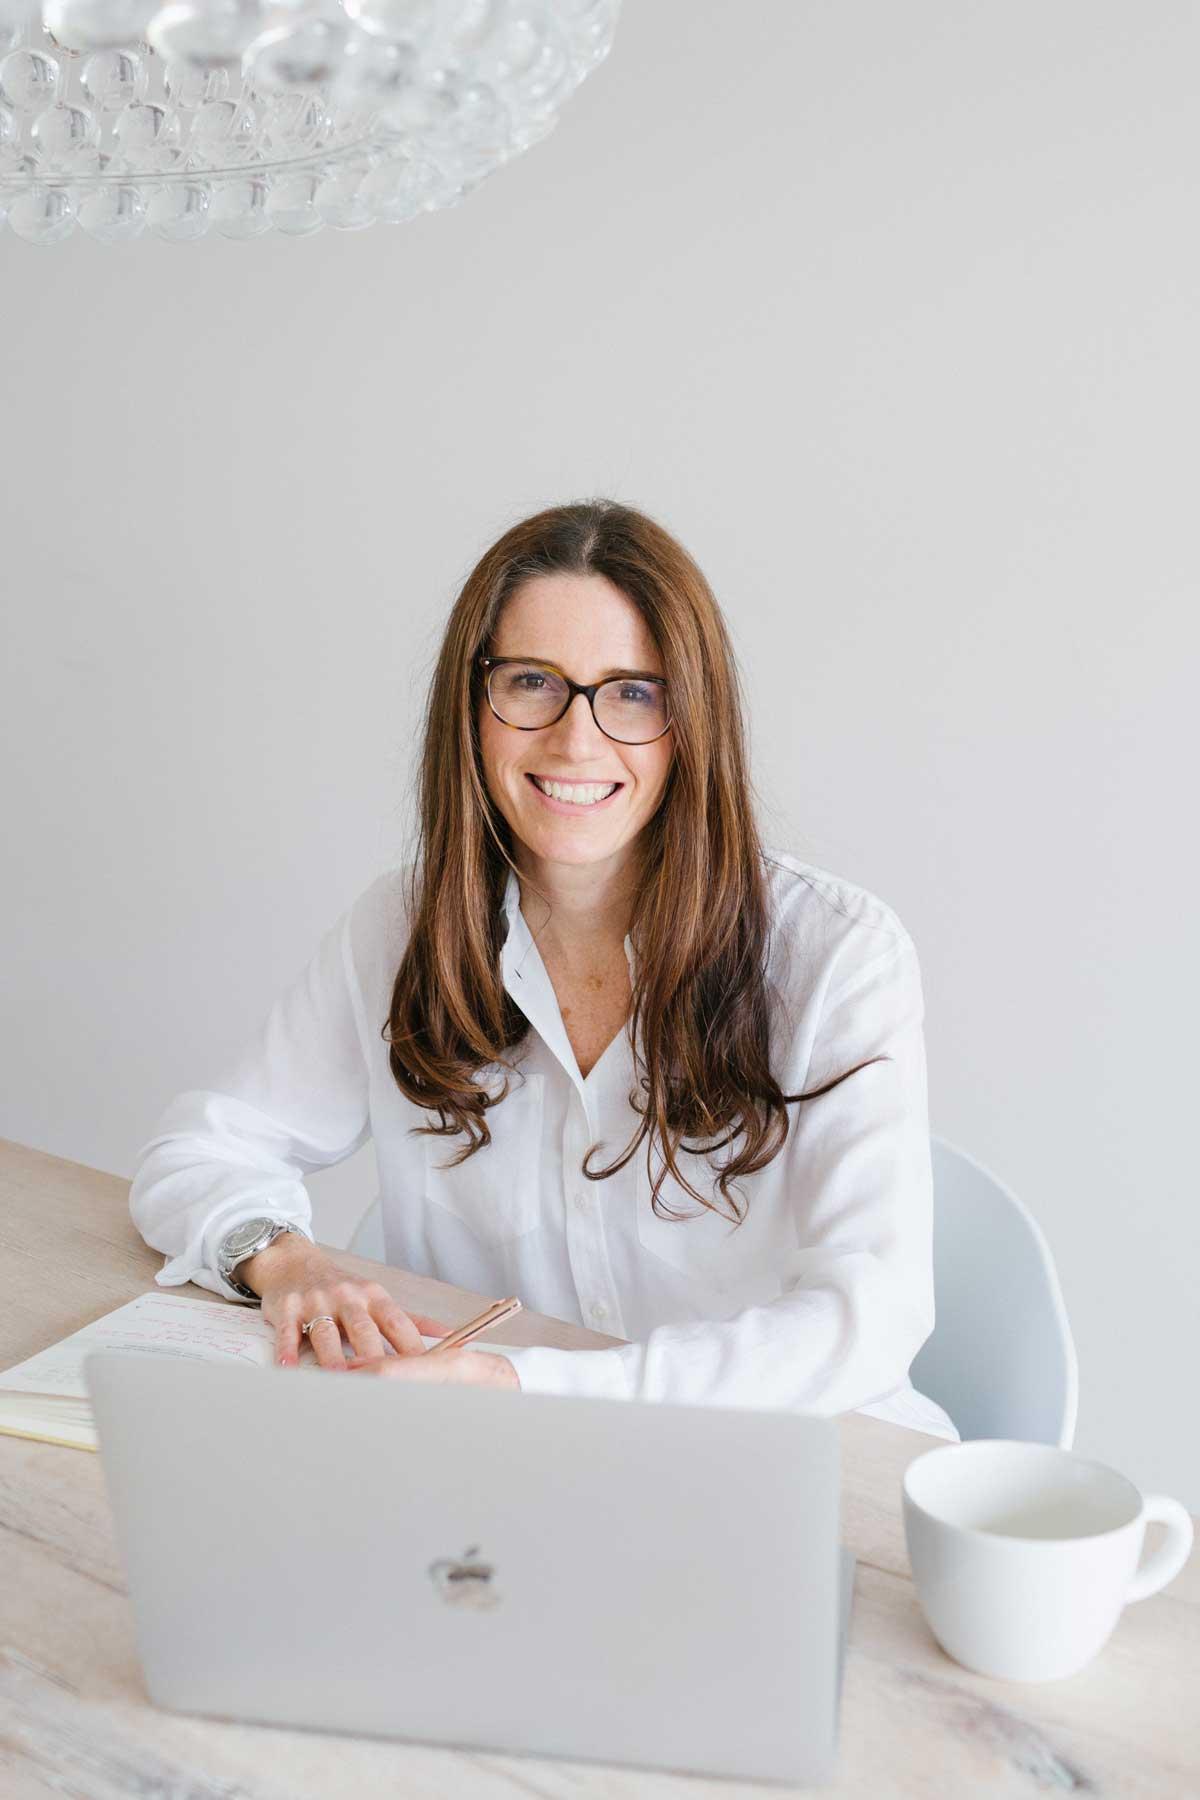 Rebecca Troch ist die Gründerin von Counting the Apples Consulting